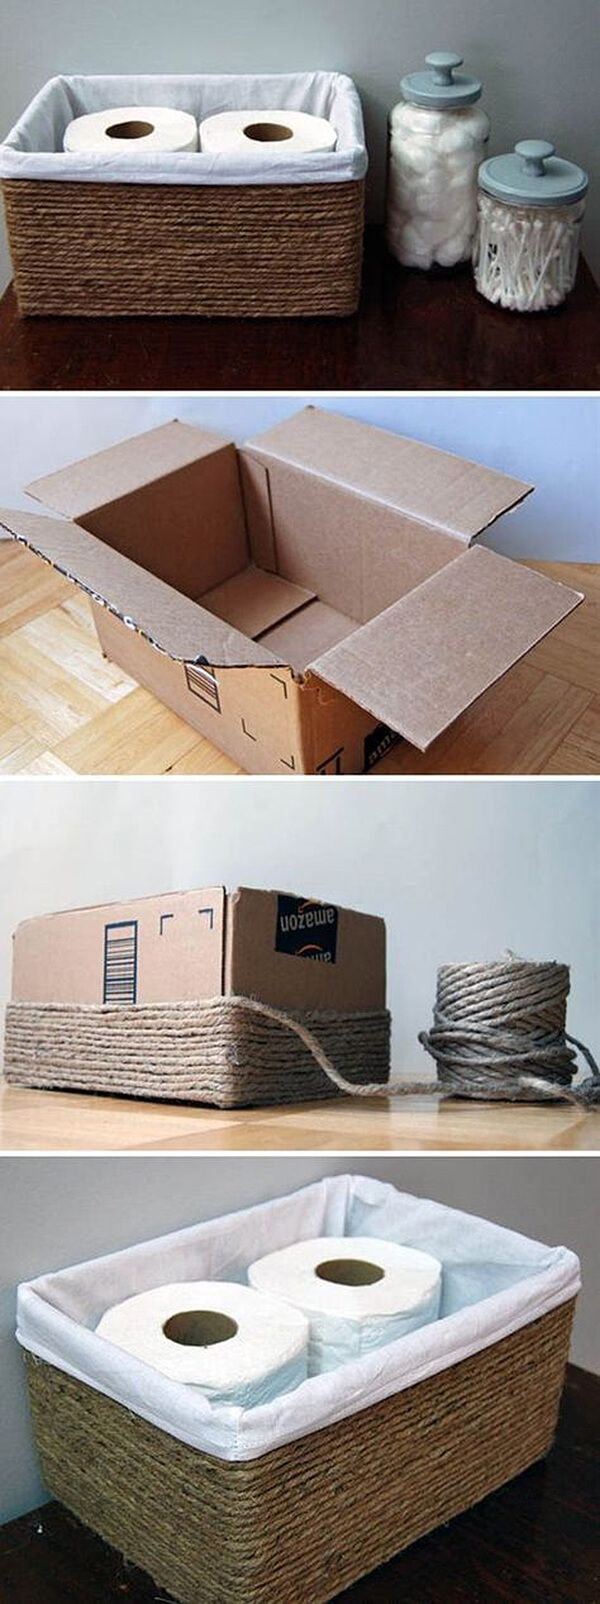 A Box Transformed into a Storage Unit